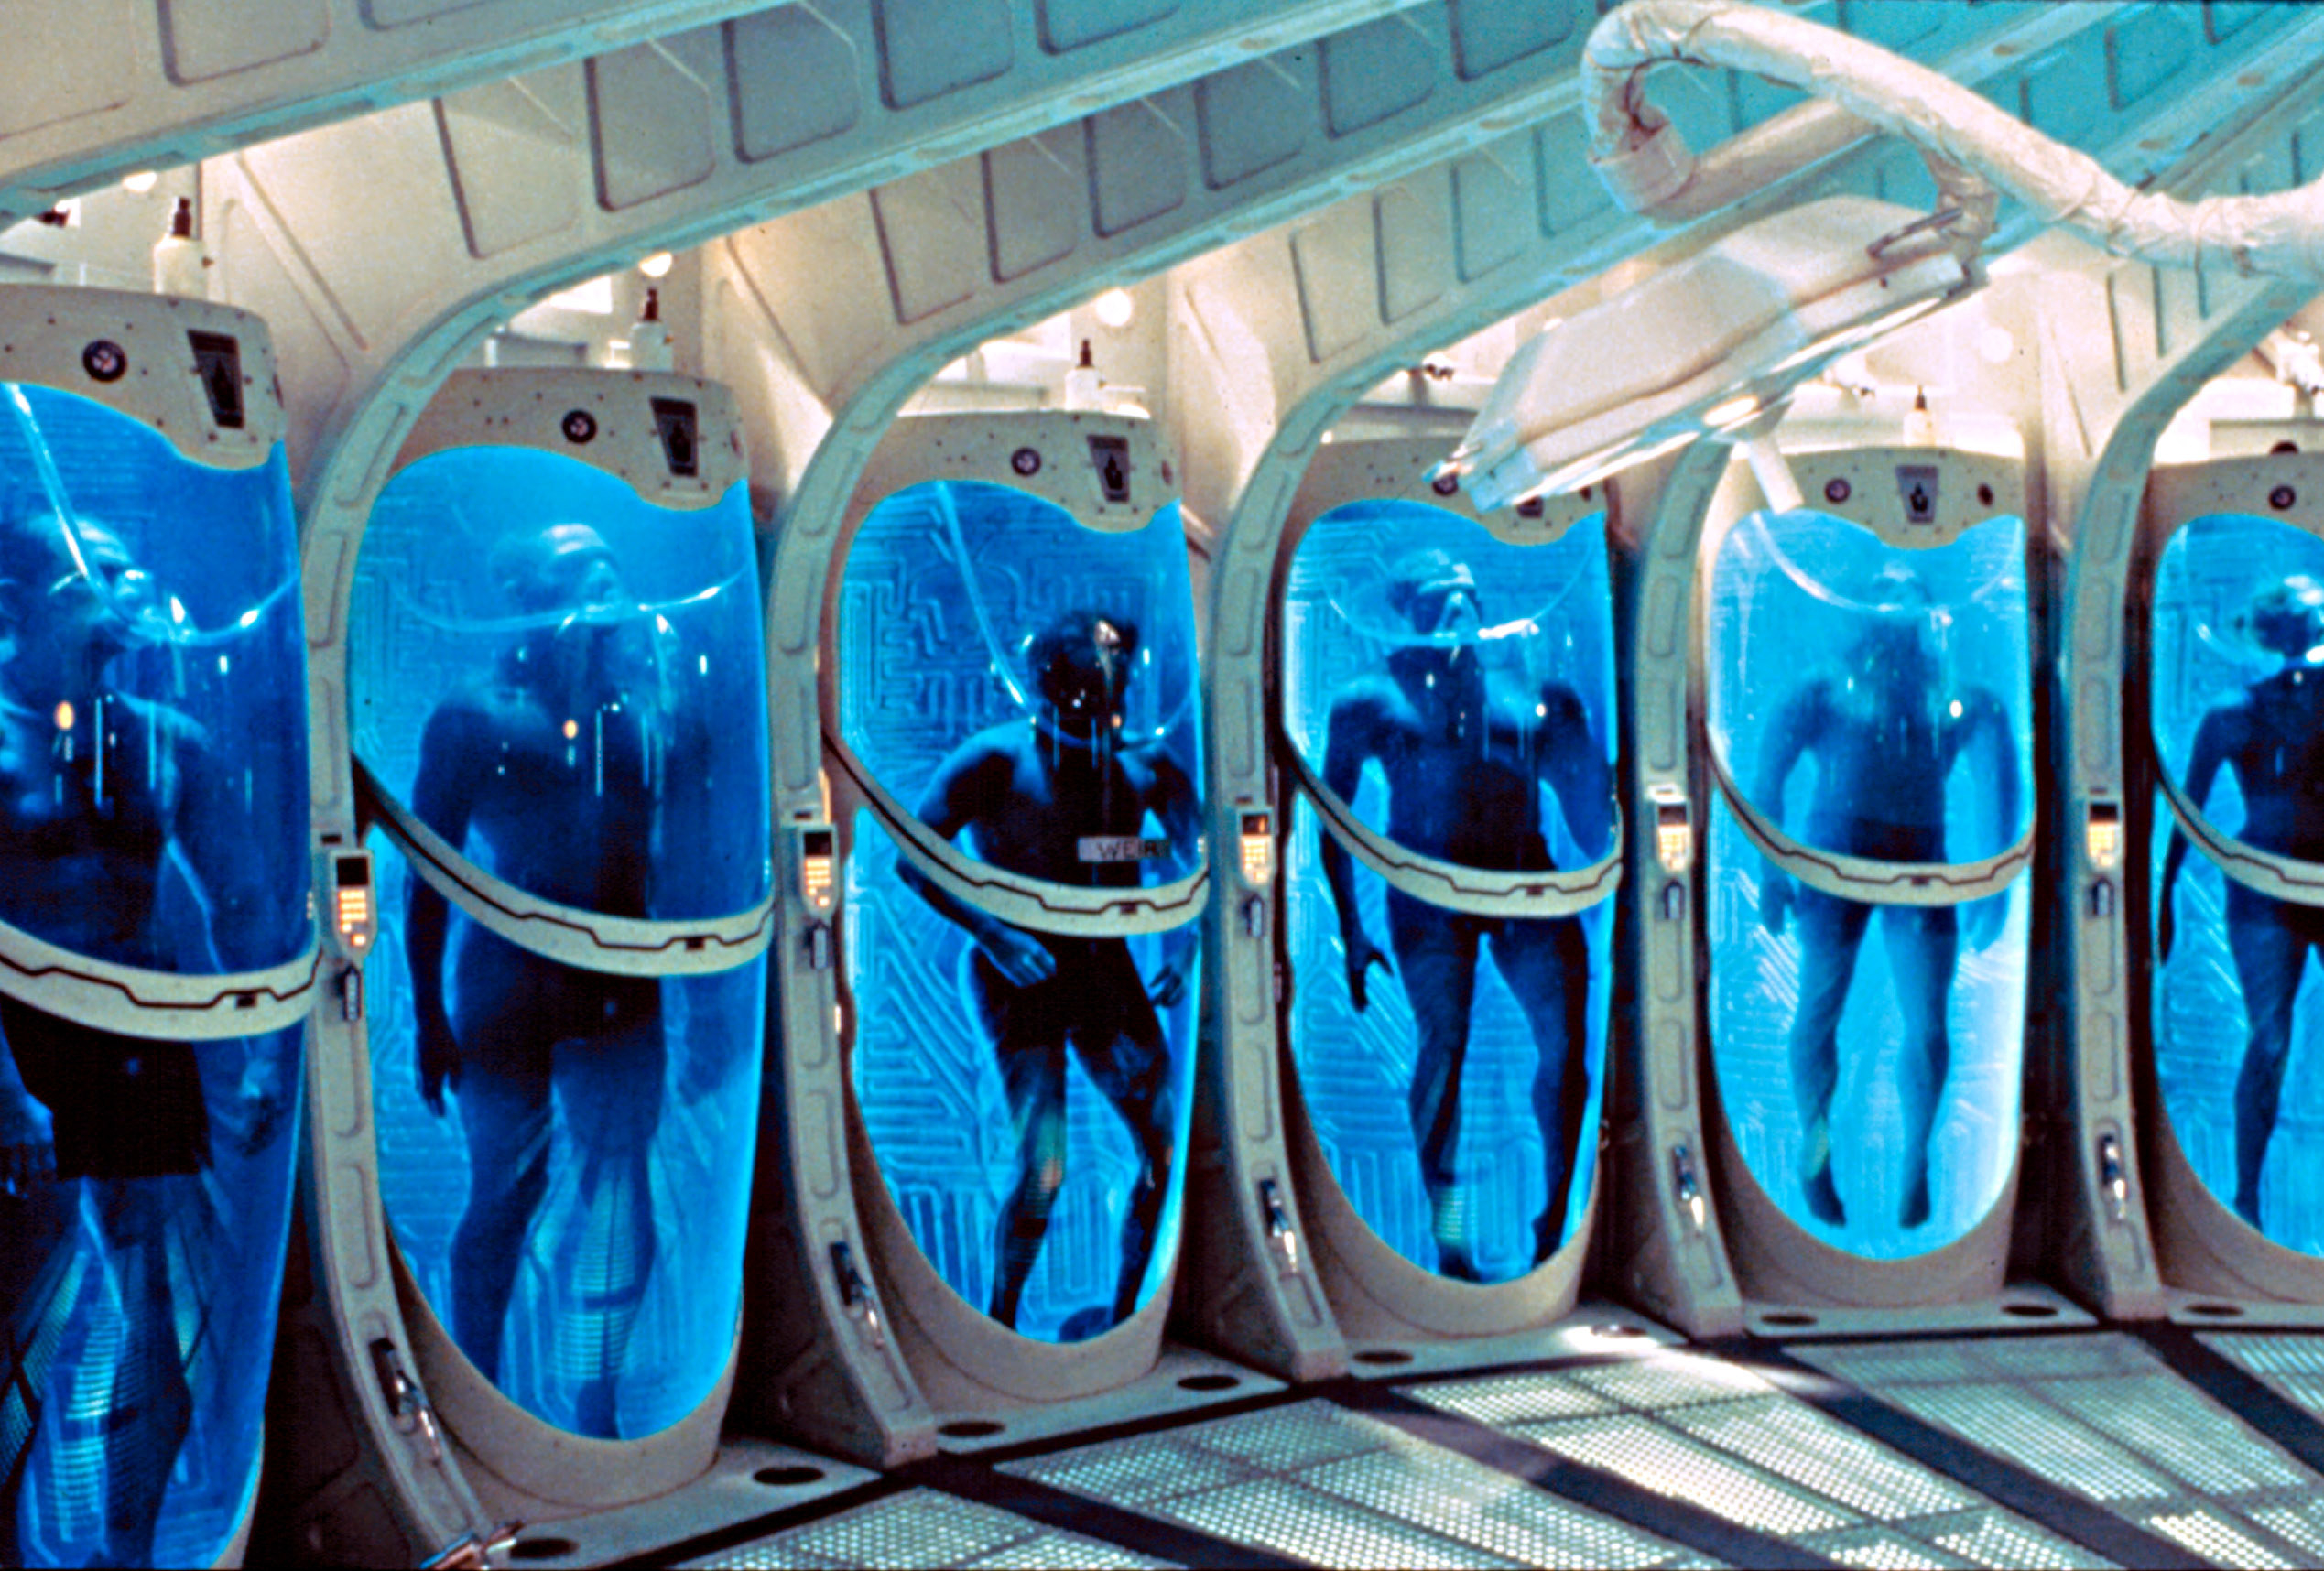 astronauts in sleep chambers